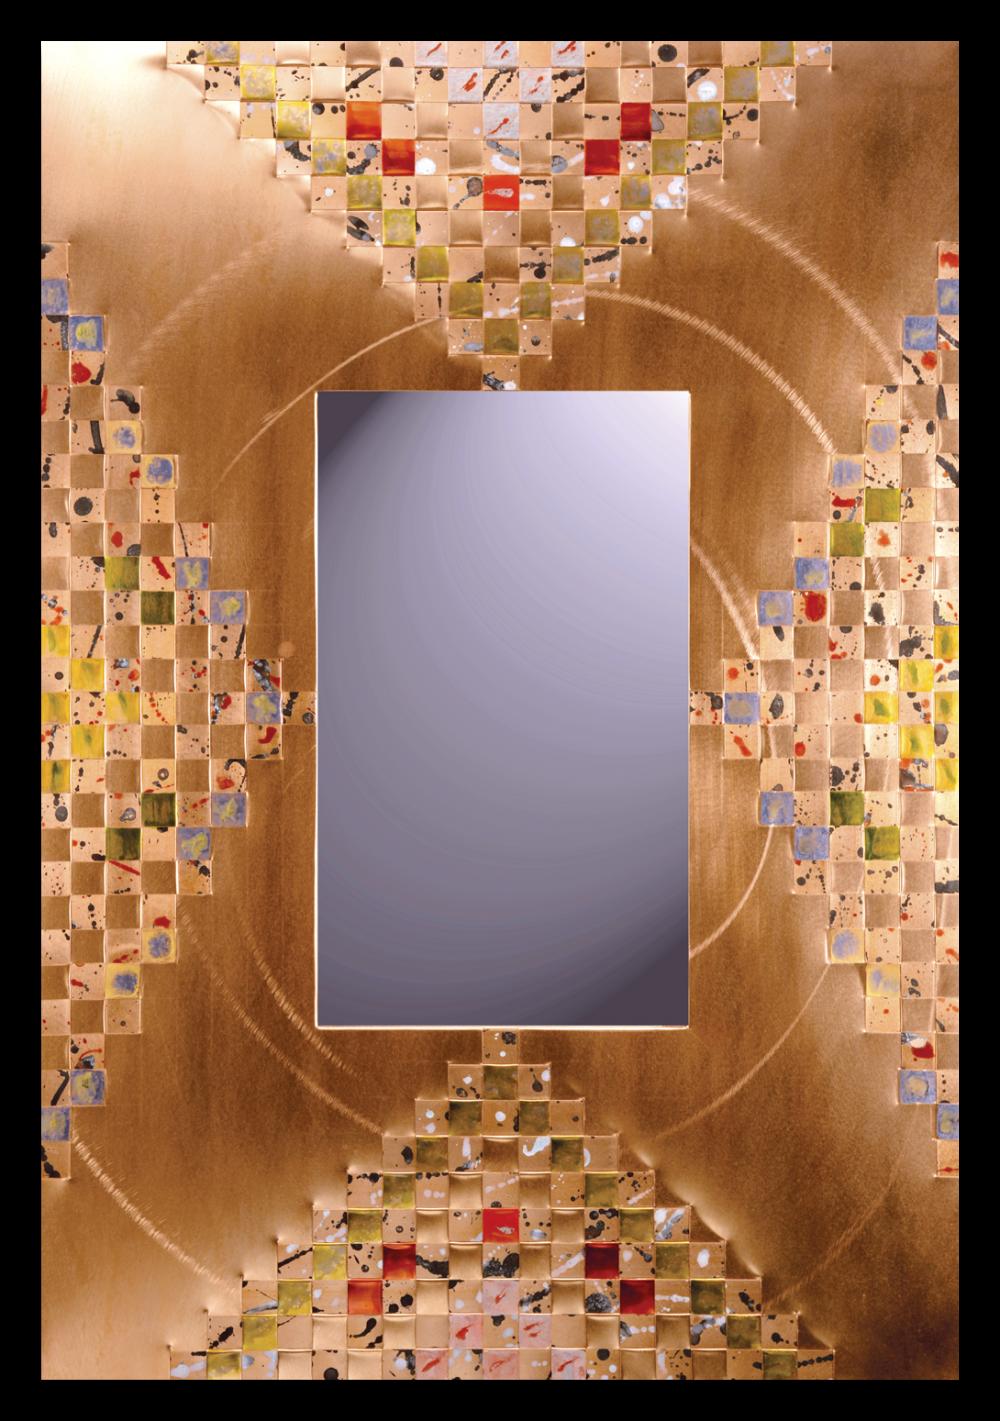 Arroyo Blanket | Tom & Jean Heffernan | Wall Art-Exposures International Gallery of Fine Art - Sedona AZ